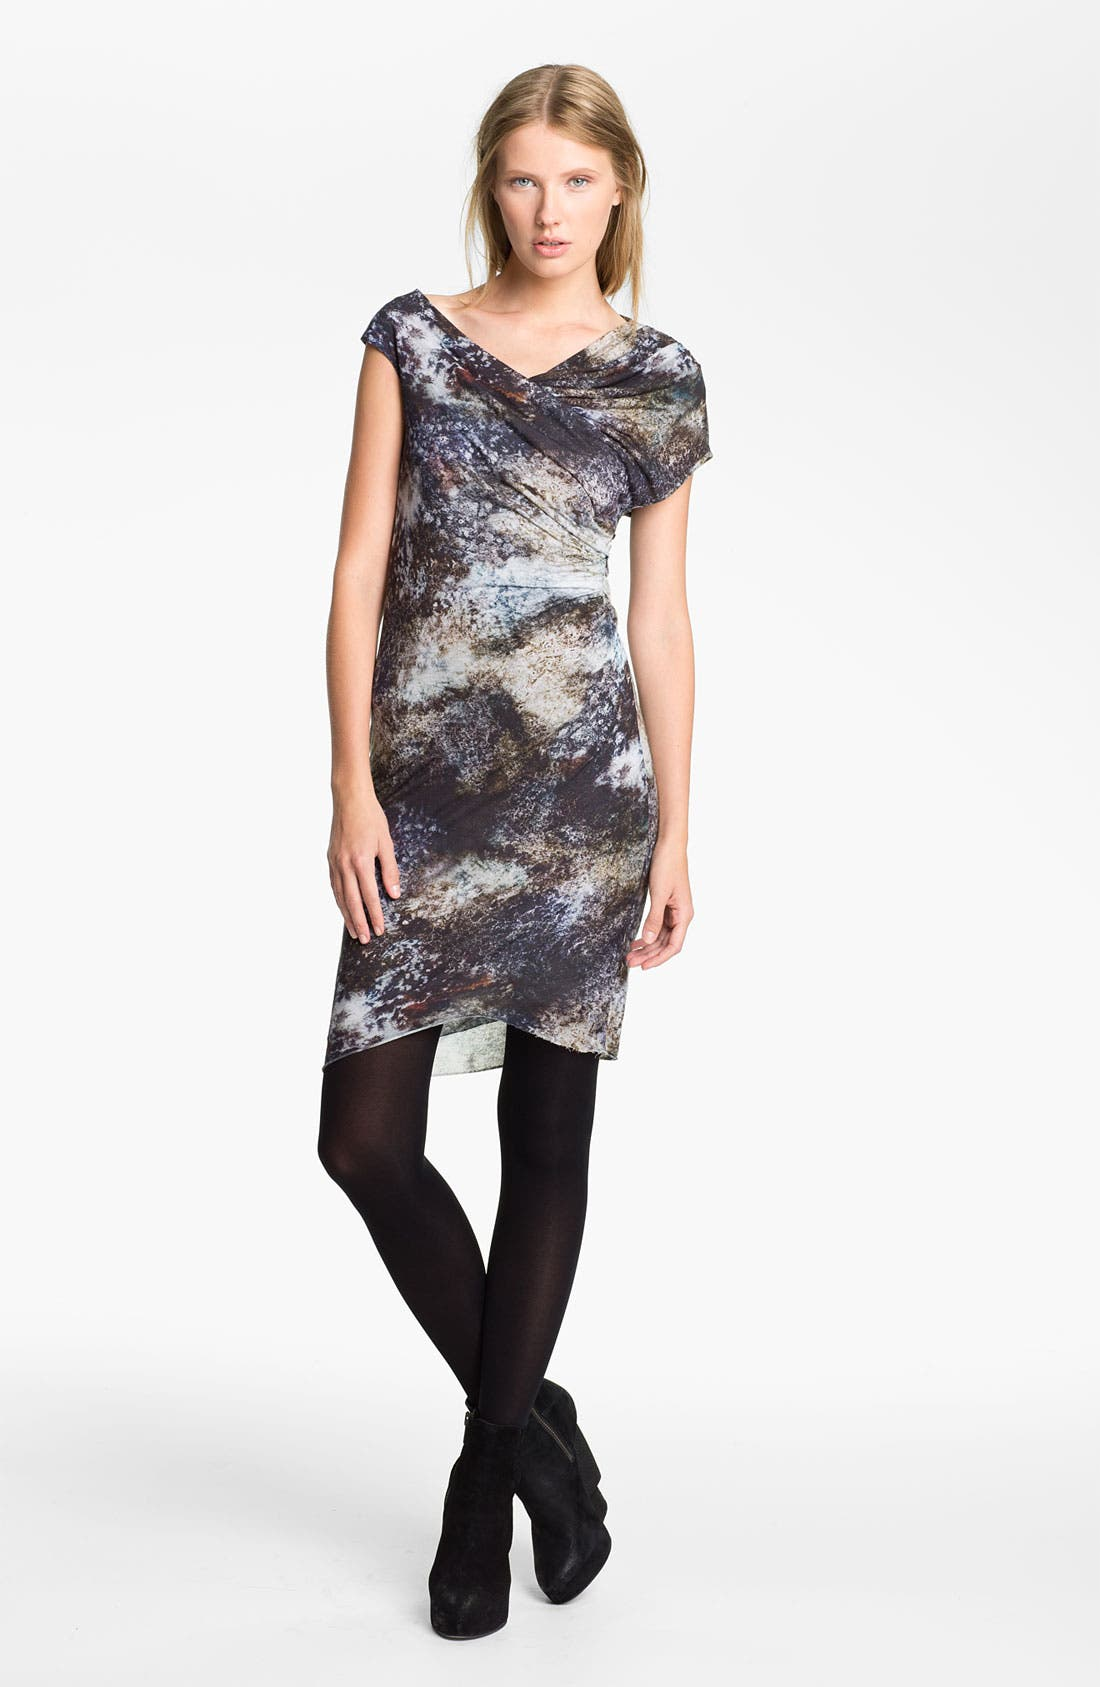 Alternate Image 1 Selected - Helmut Lang 'Oxide Print' Twisted Dress